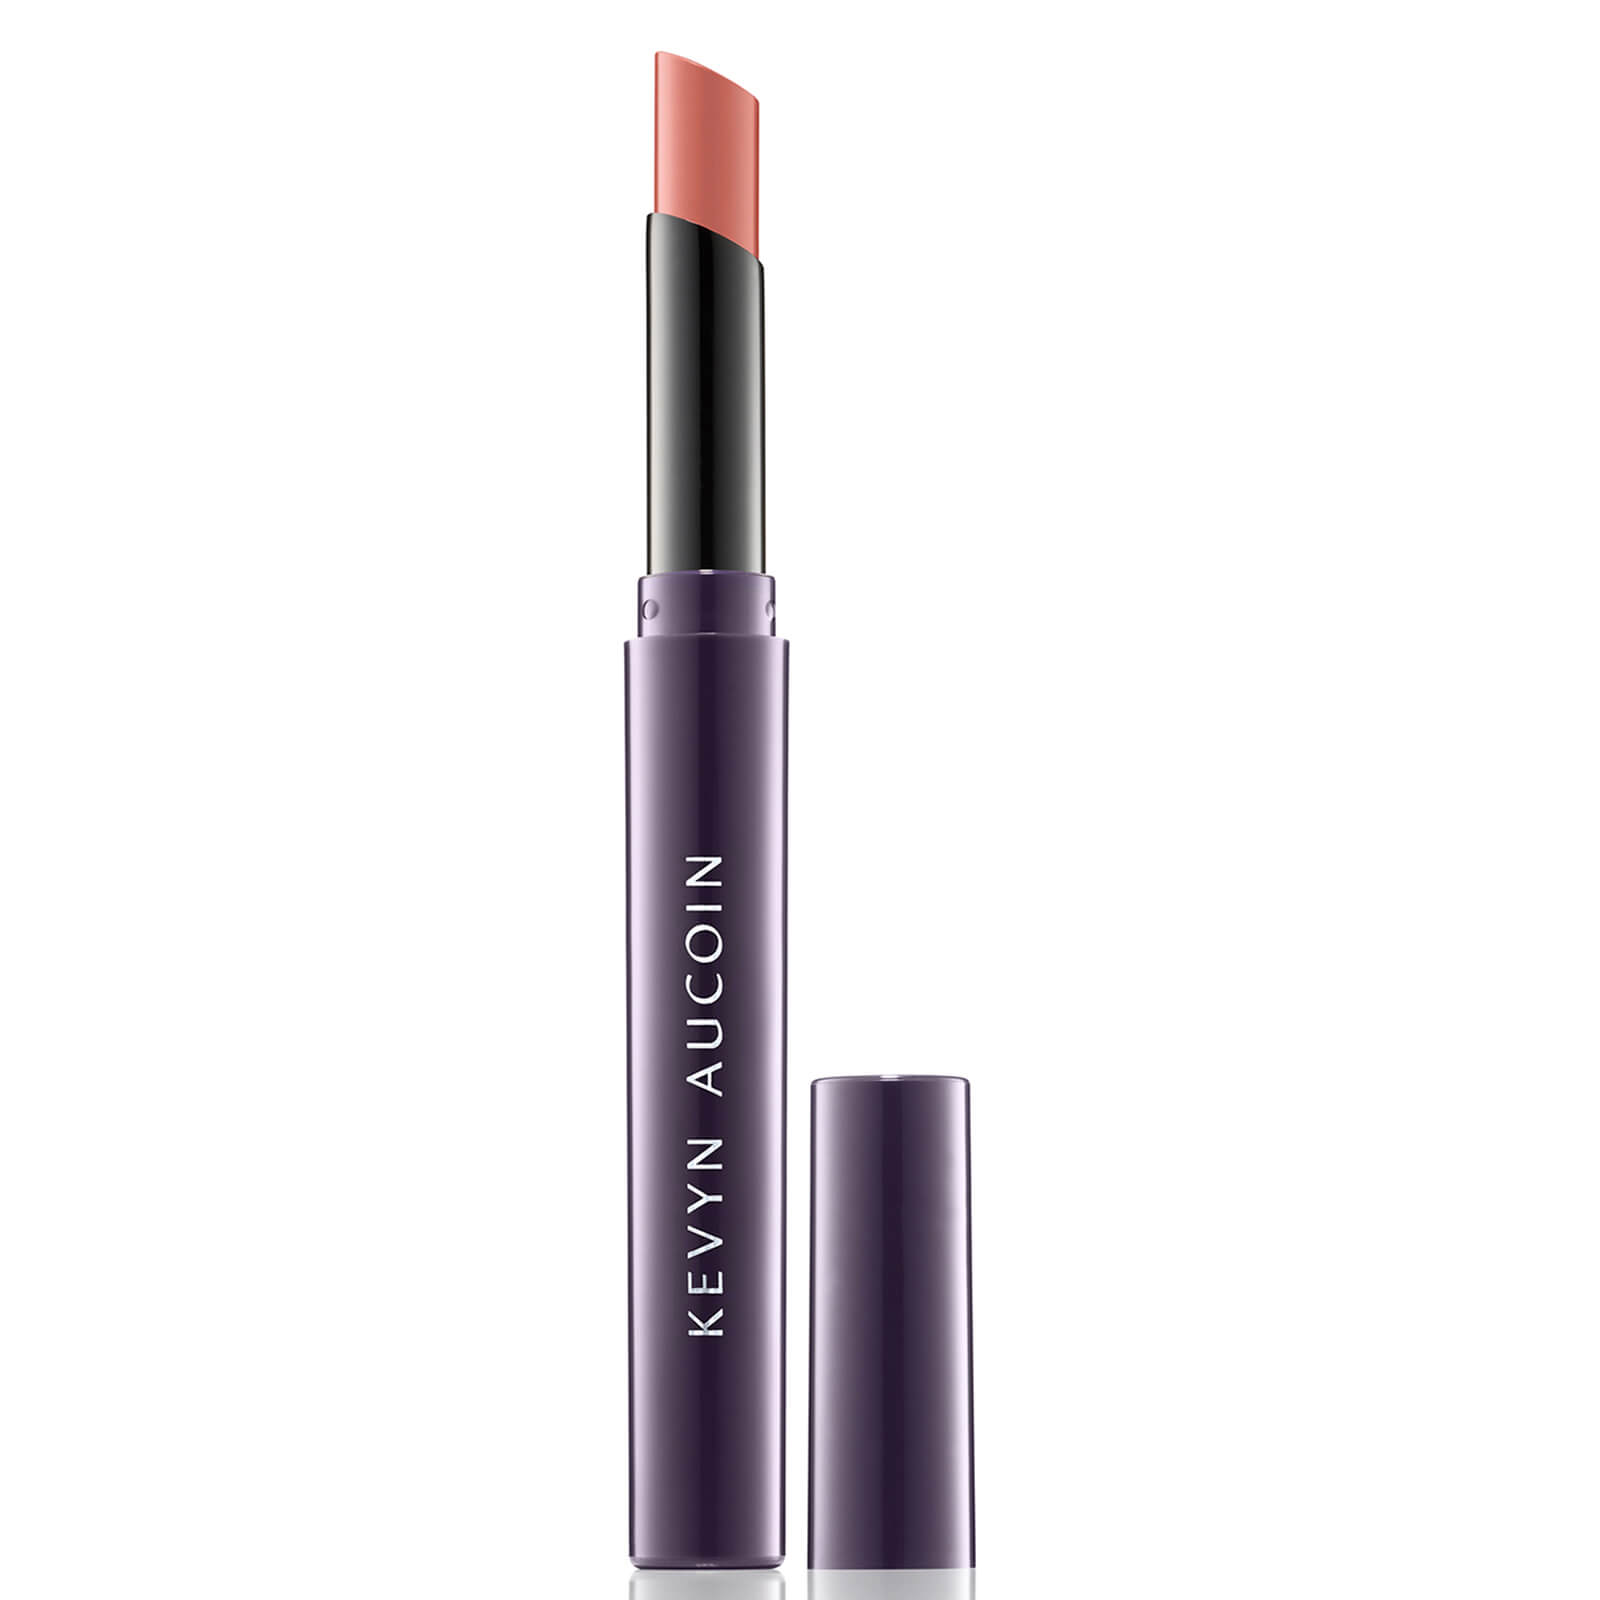 Kevyn Aucoin Unforgettable Lipstick 2g (Various Shades) - Matte - Infinite